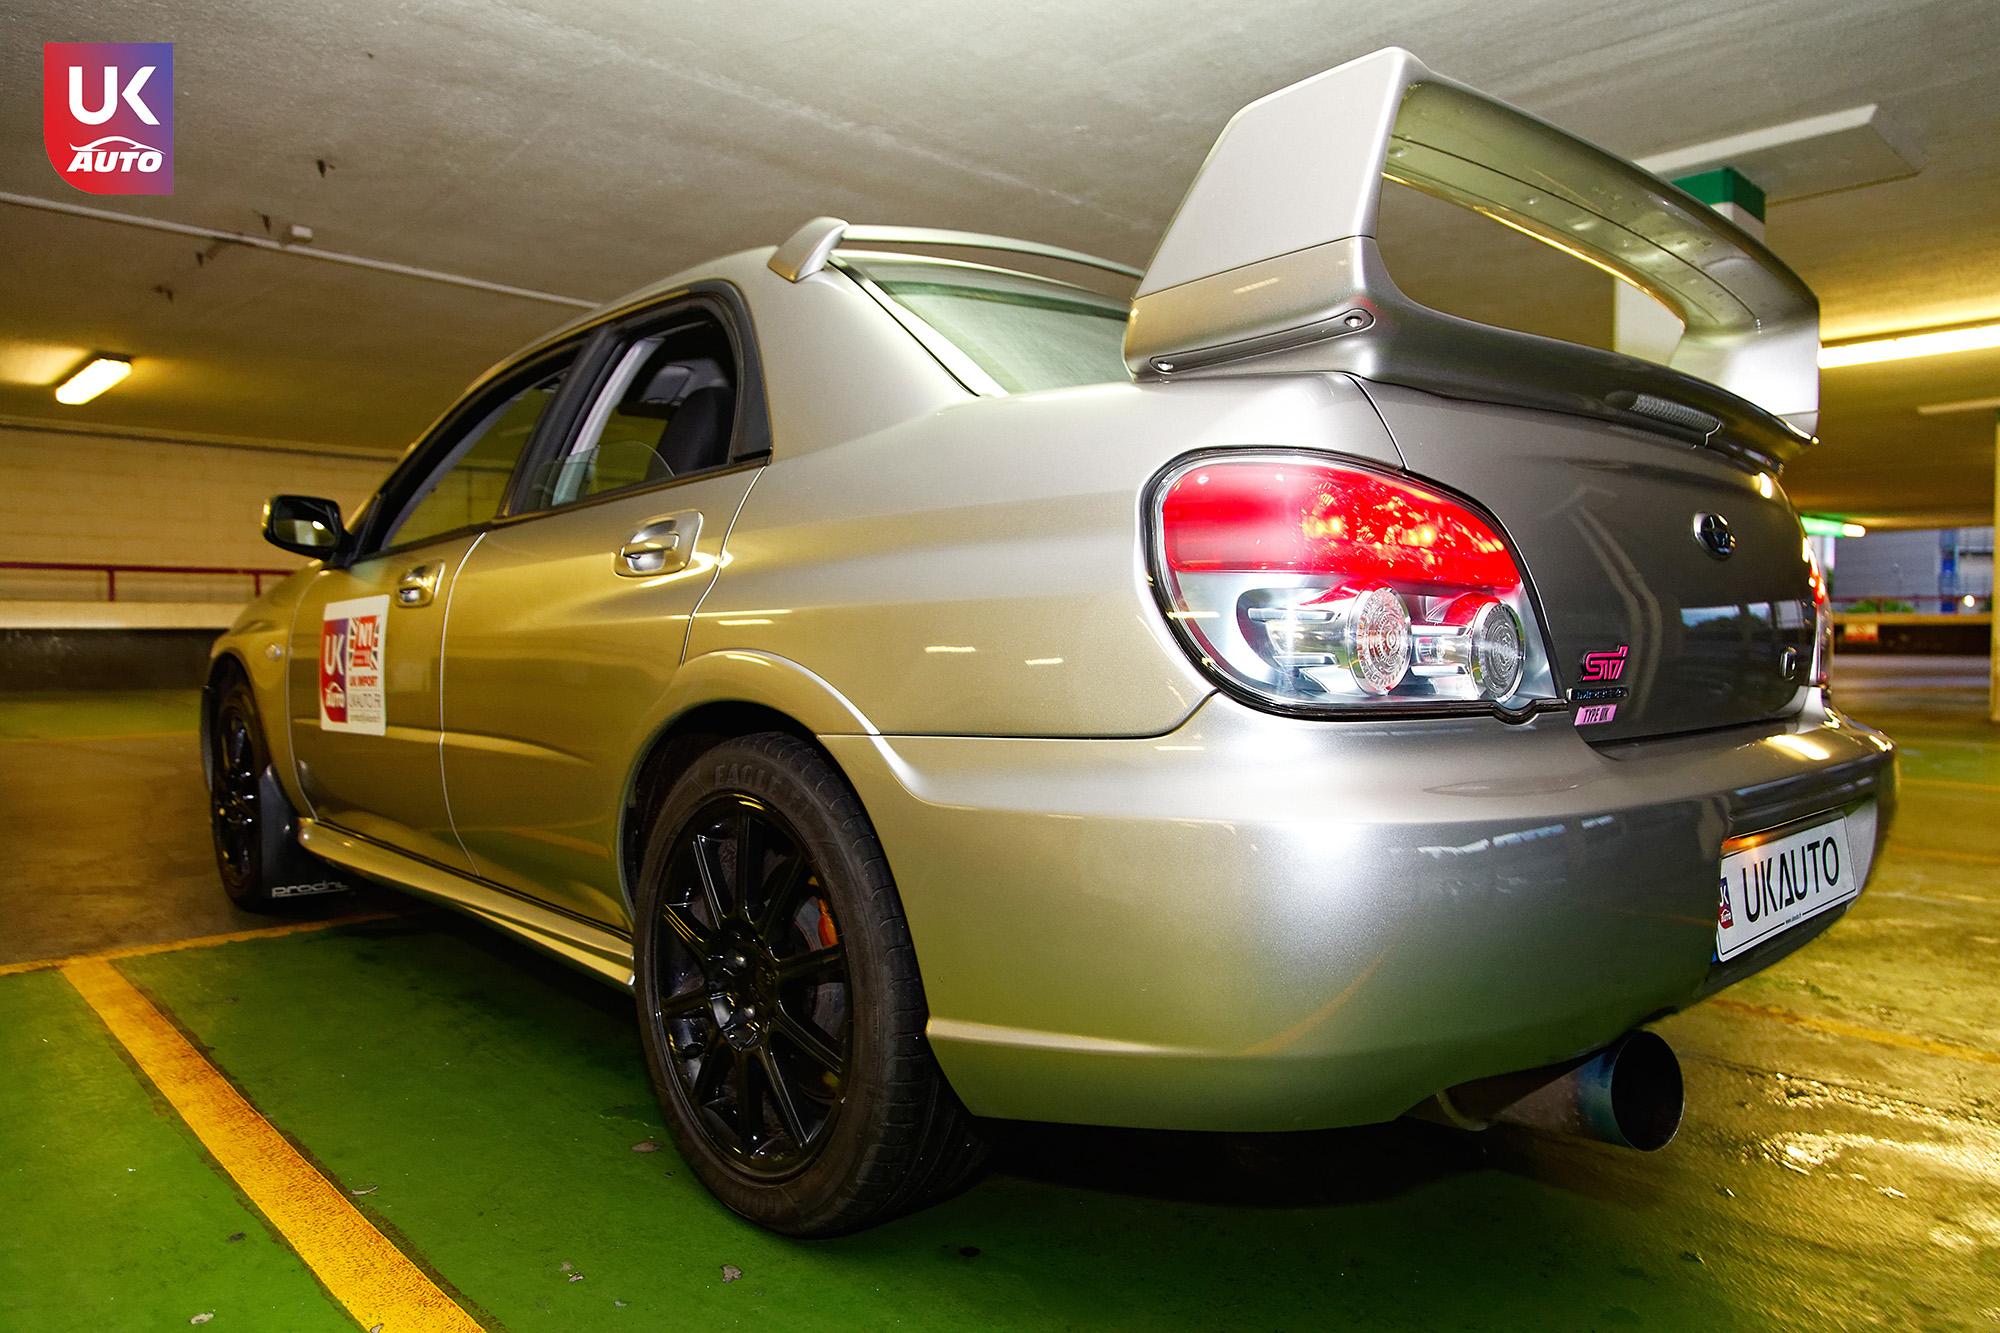 import subaru impreza wrx sti rhd import voiture angleterre auto import9 - Felecitation a Christophe pour cette Subaru Impreza Wrx Sti RHD Supercharged Importation voiture angleterre